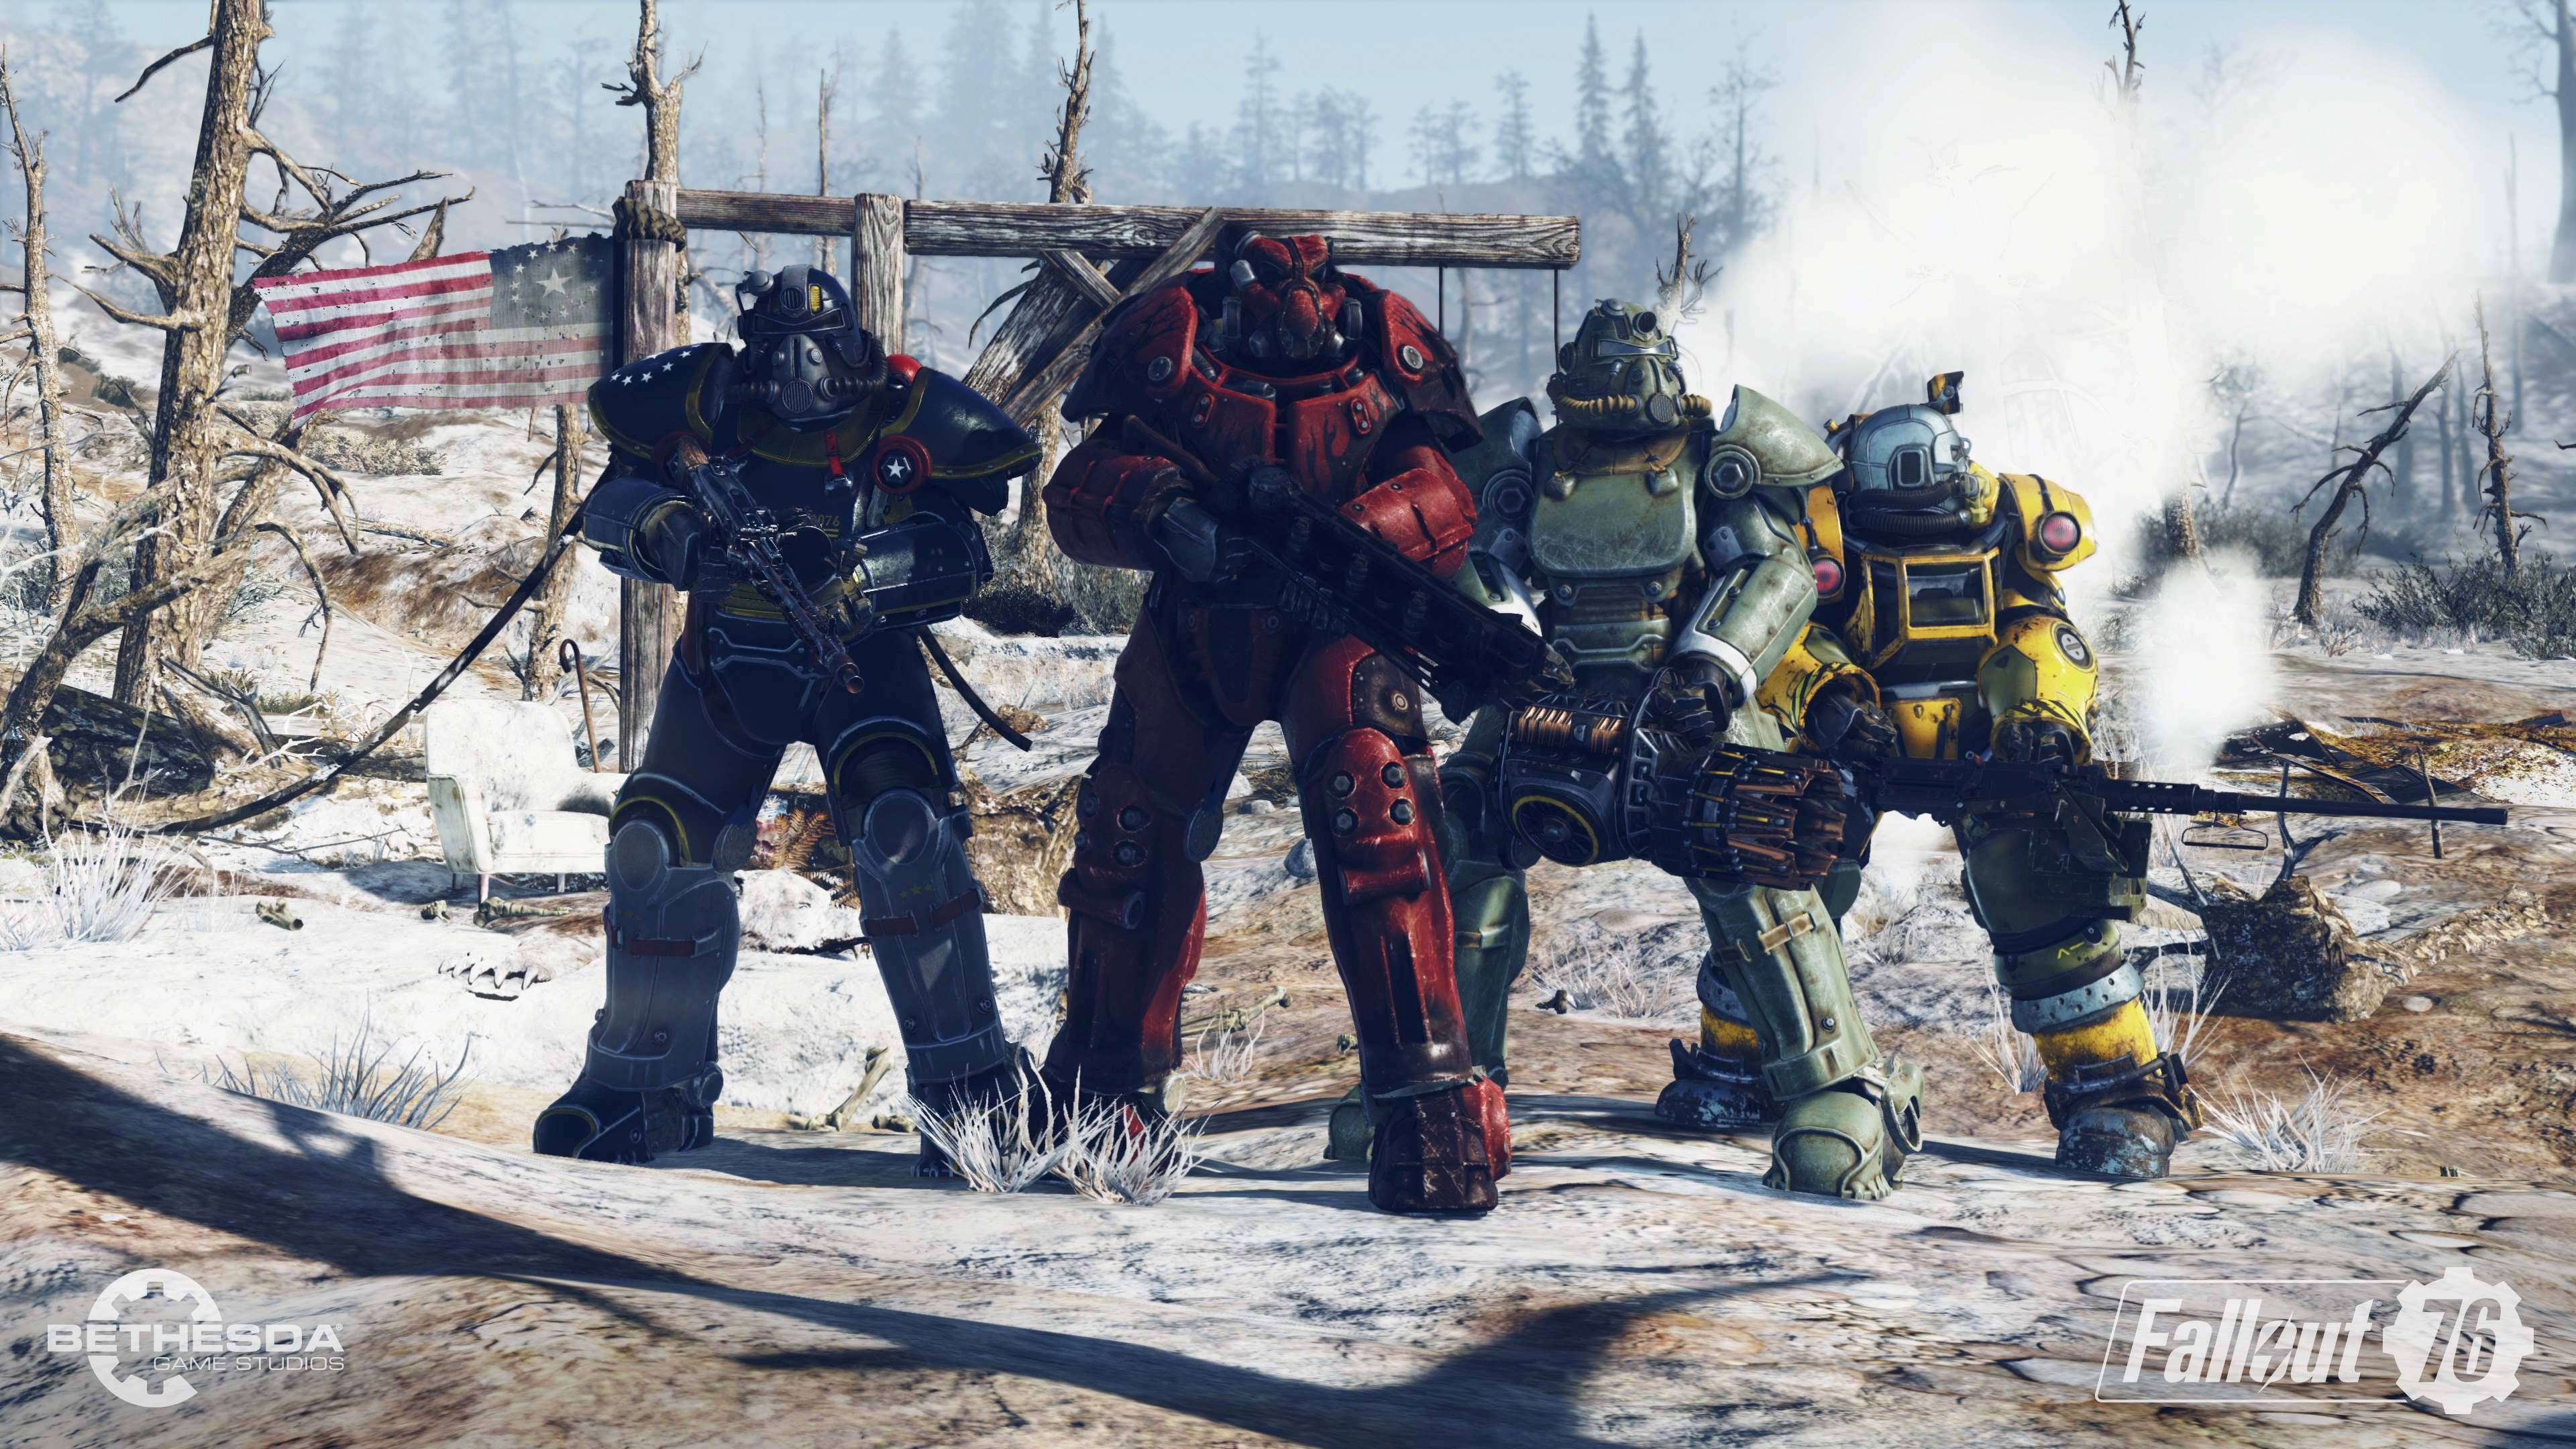 Fallout 76 no estará disponible en Steam